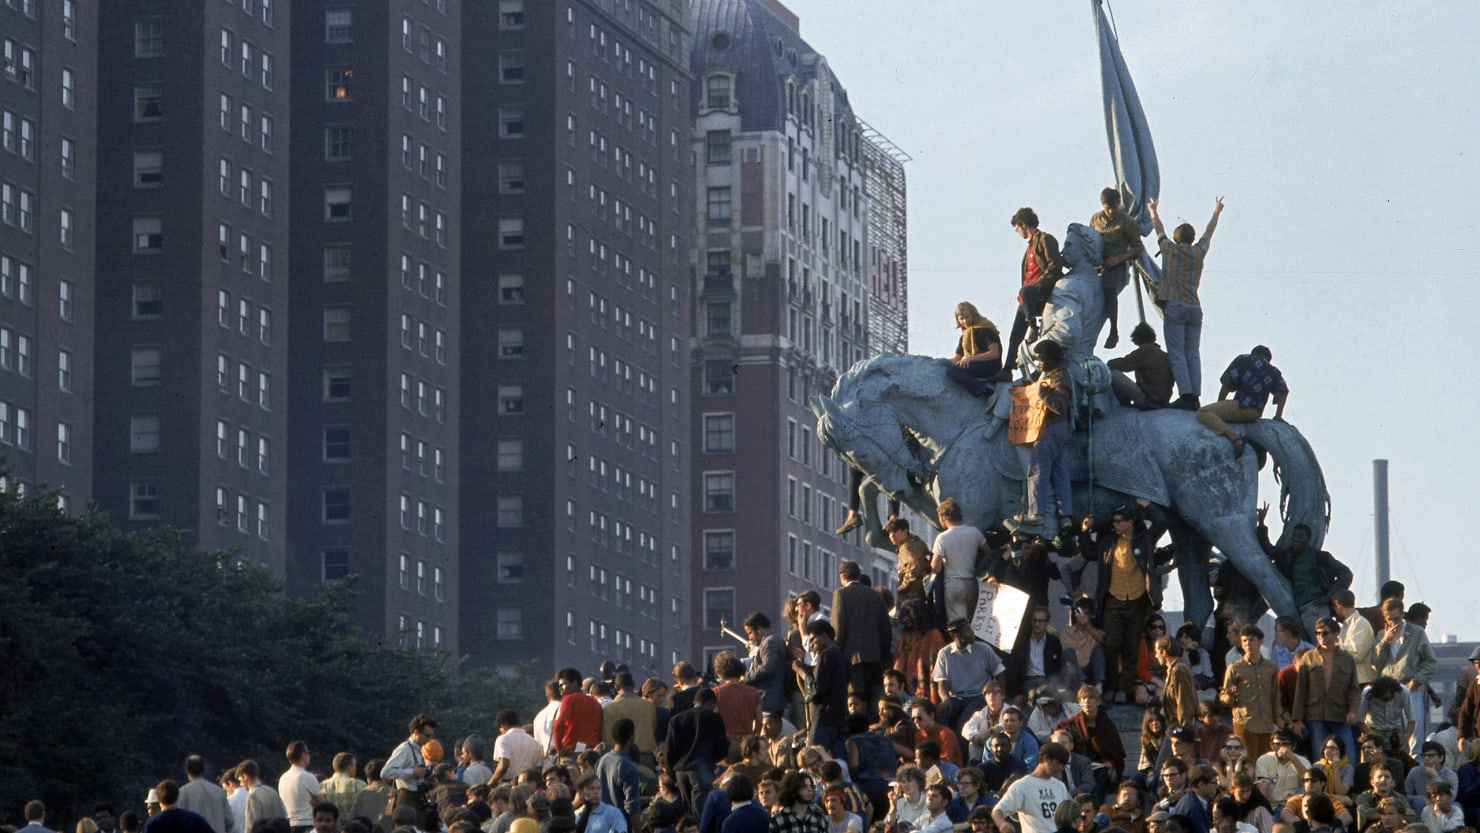 Do I Remember the '68 DNC Riots? Dude, I Played Them